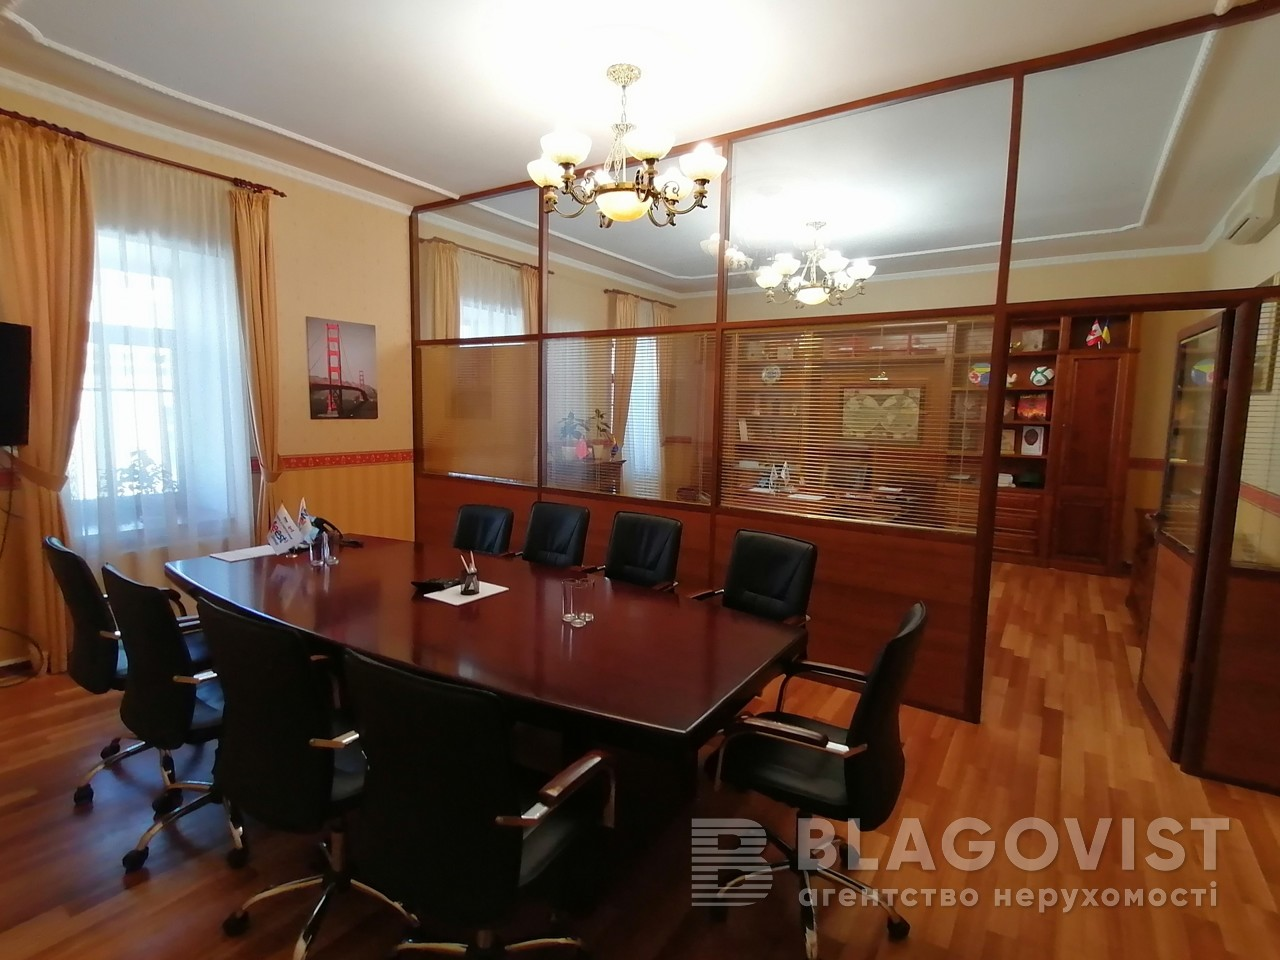 Офис, Круглоуниверситетская, Киев, F-43314 - Фото 14